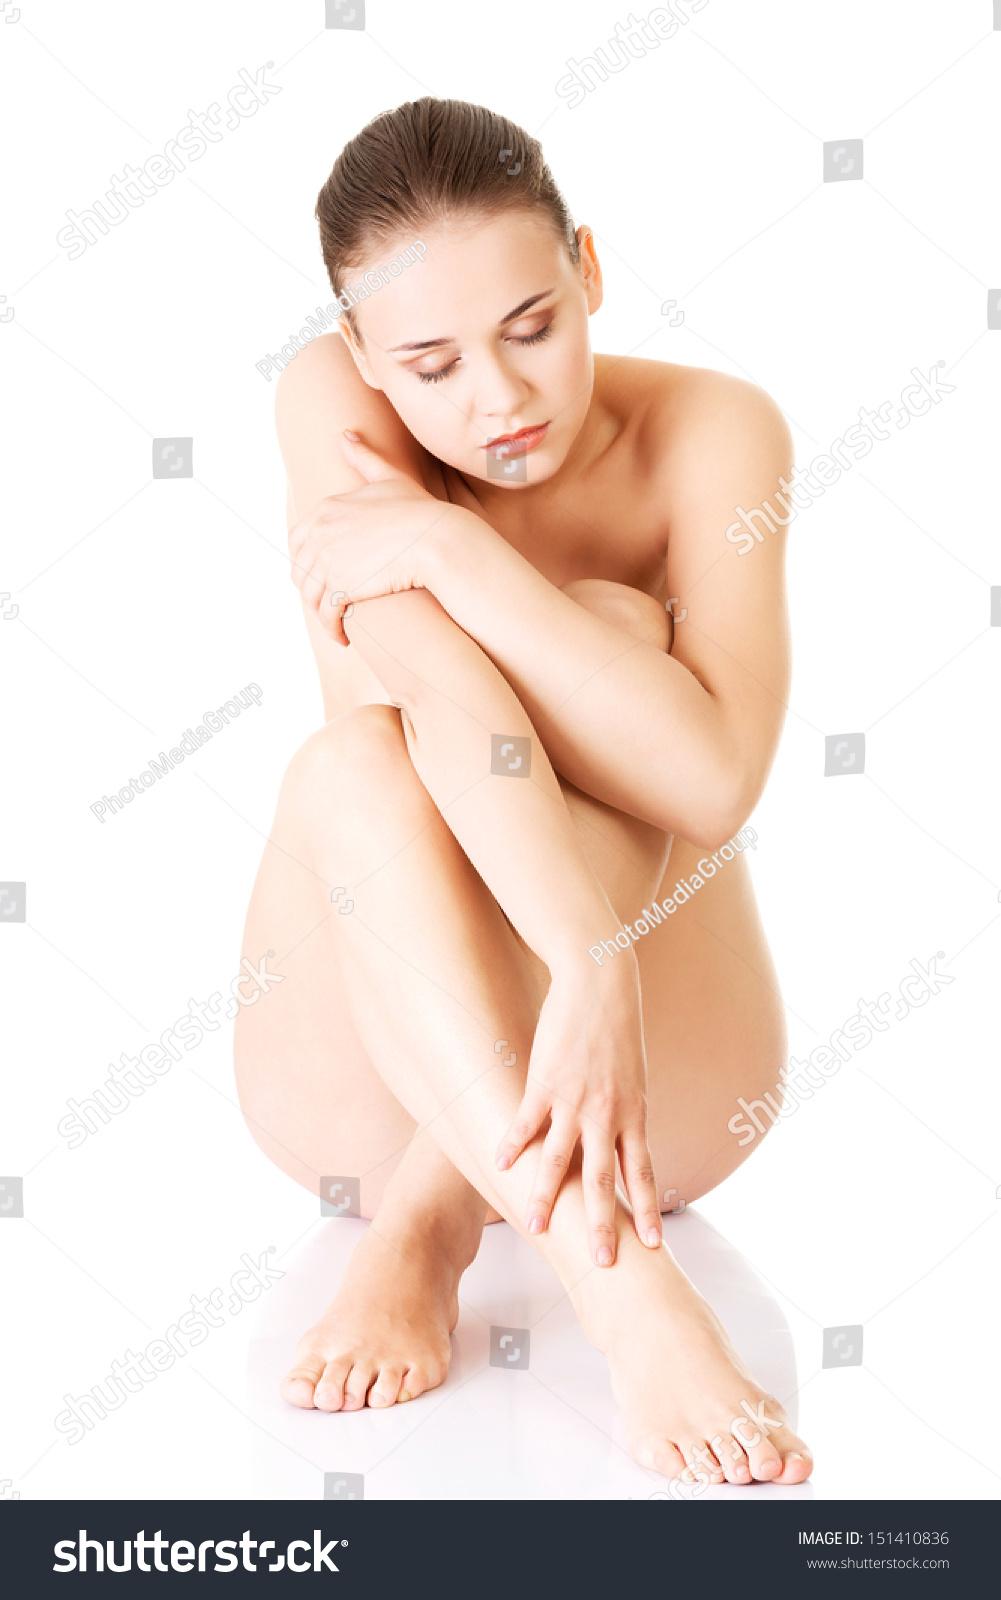 Women background nude beautiful white